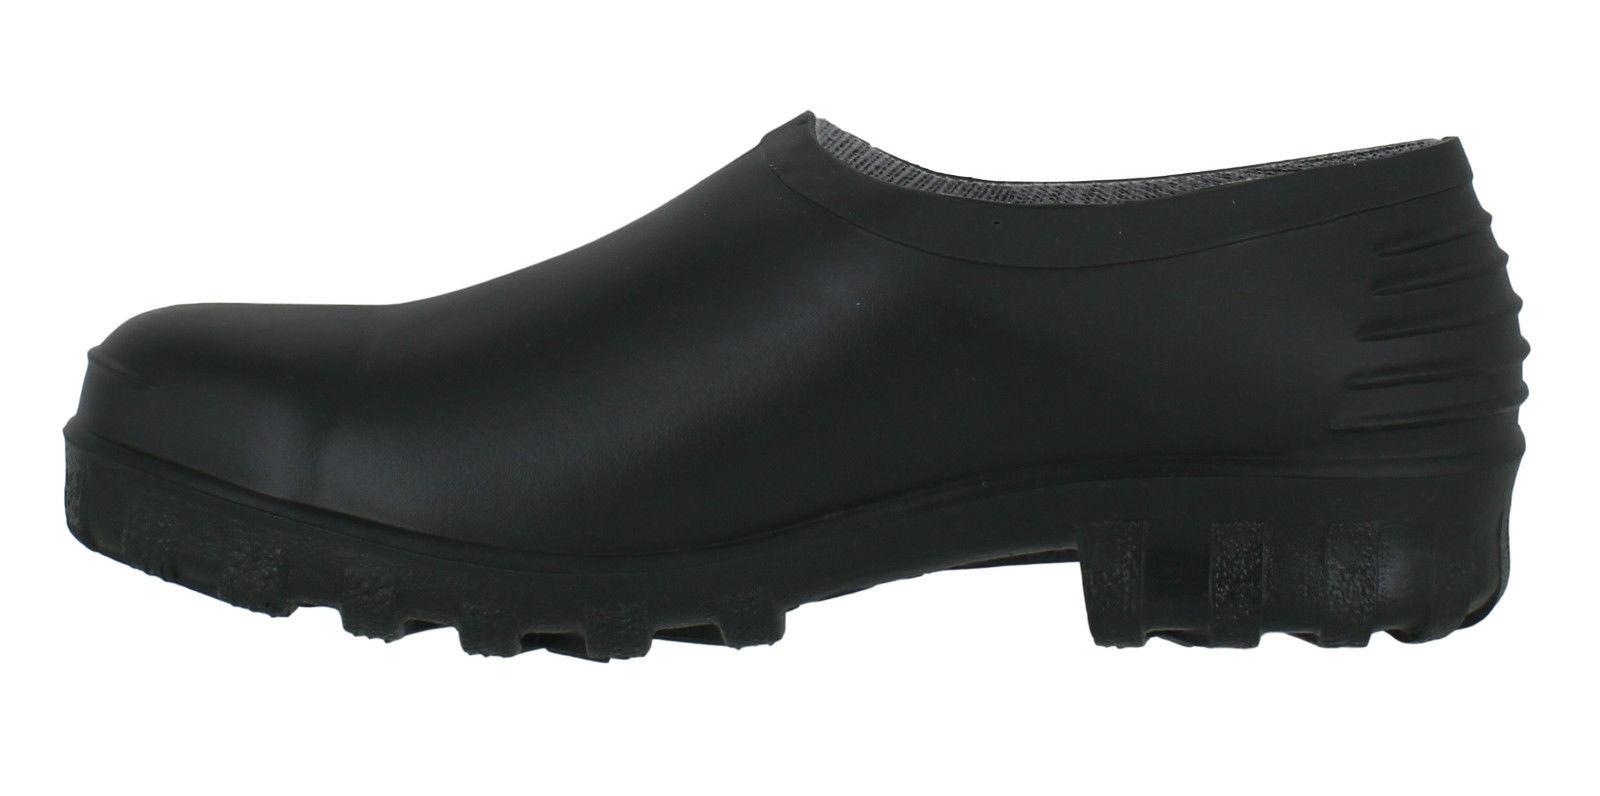 Terrasse Grün Dunlop Damen Niedrige Schuhe Gartenamp; Herren MzVpSGqU